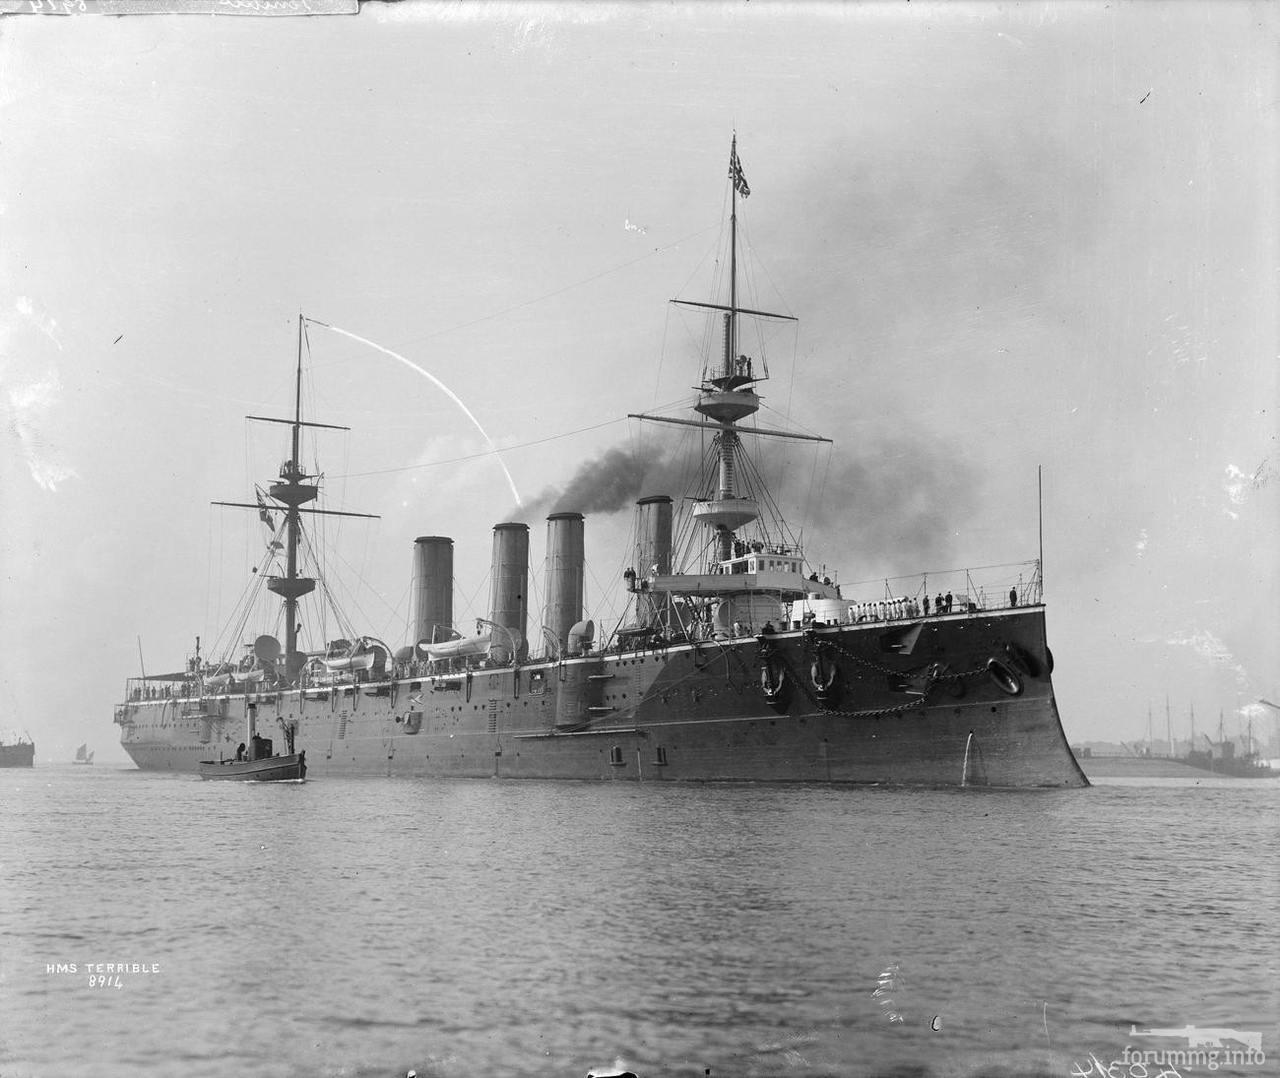 128226 - Бронепалубный крейсер HMS Terrible